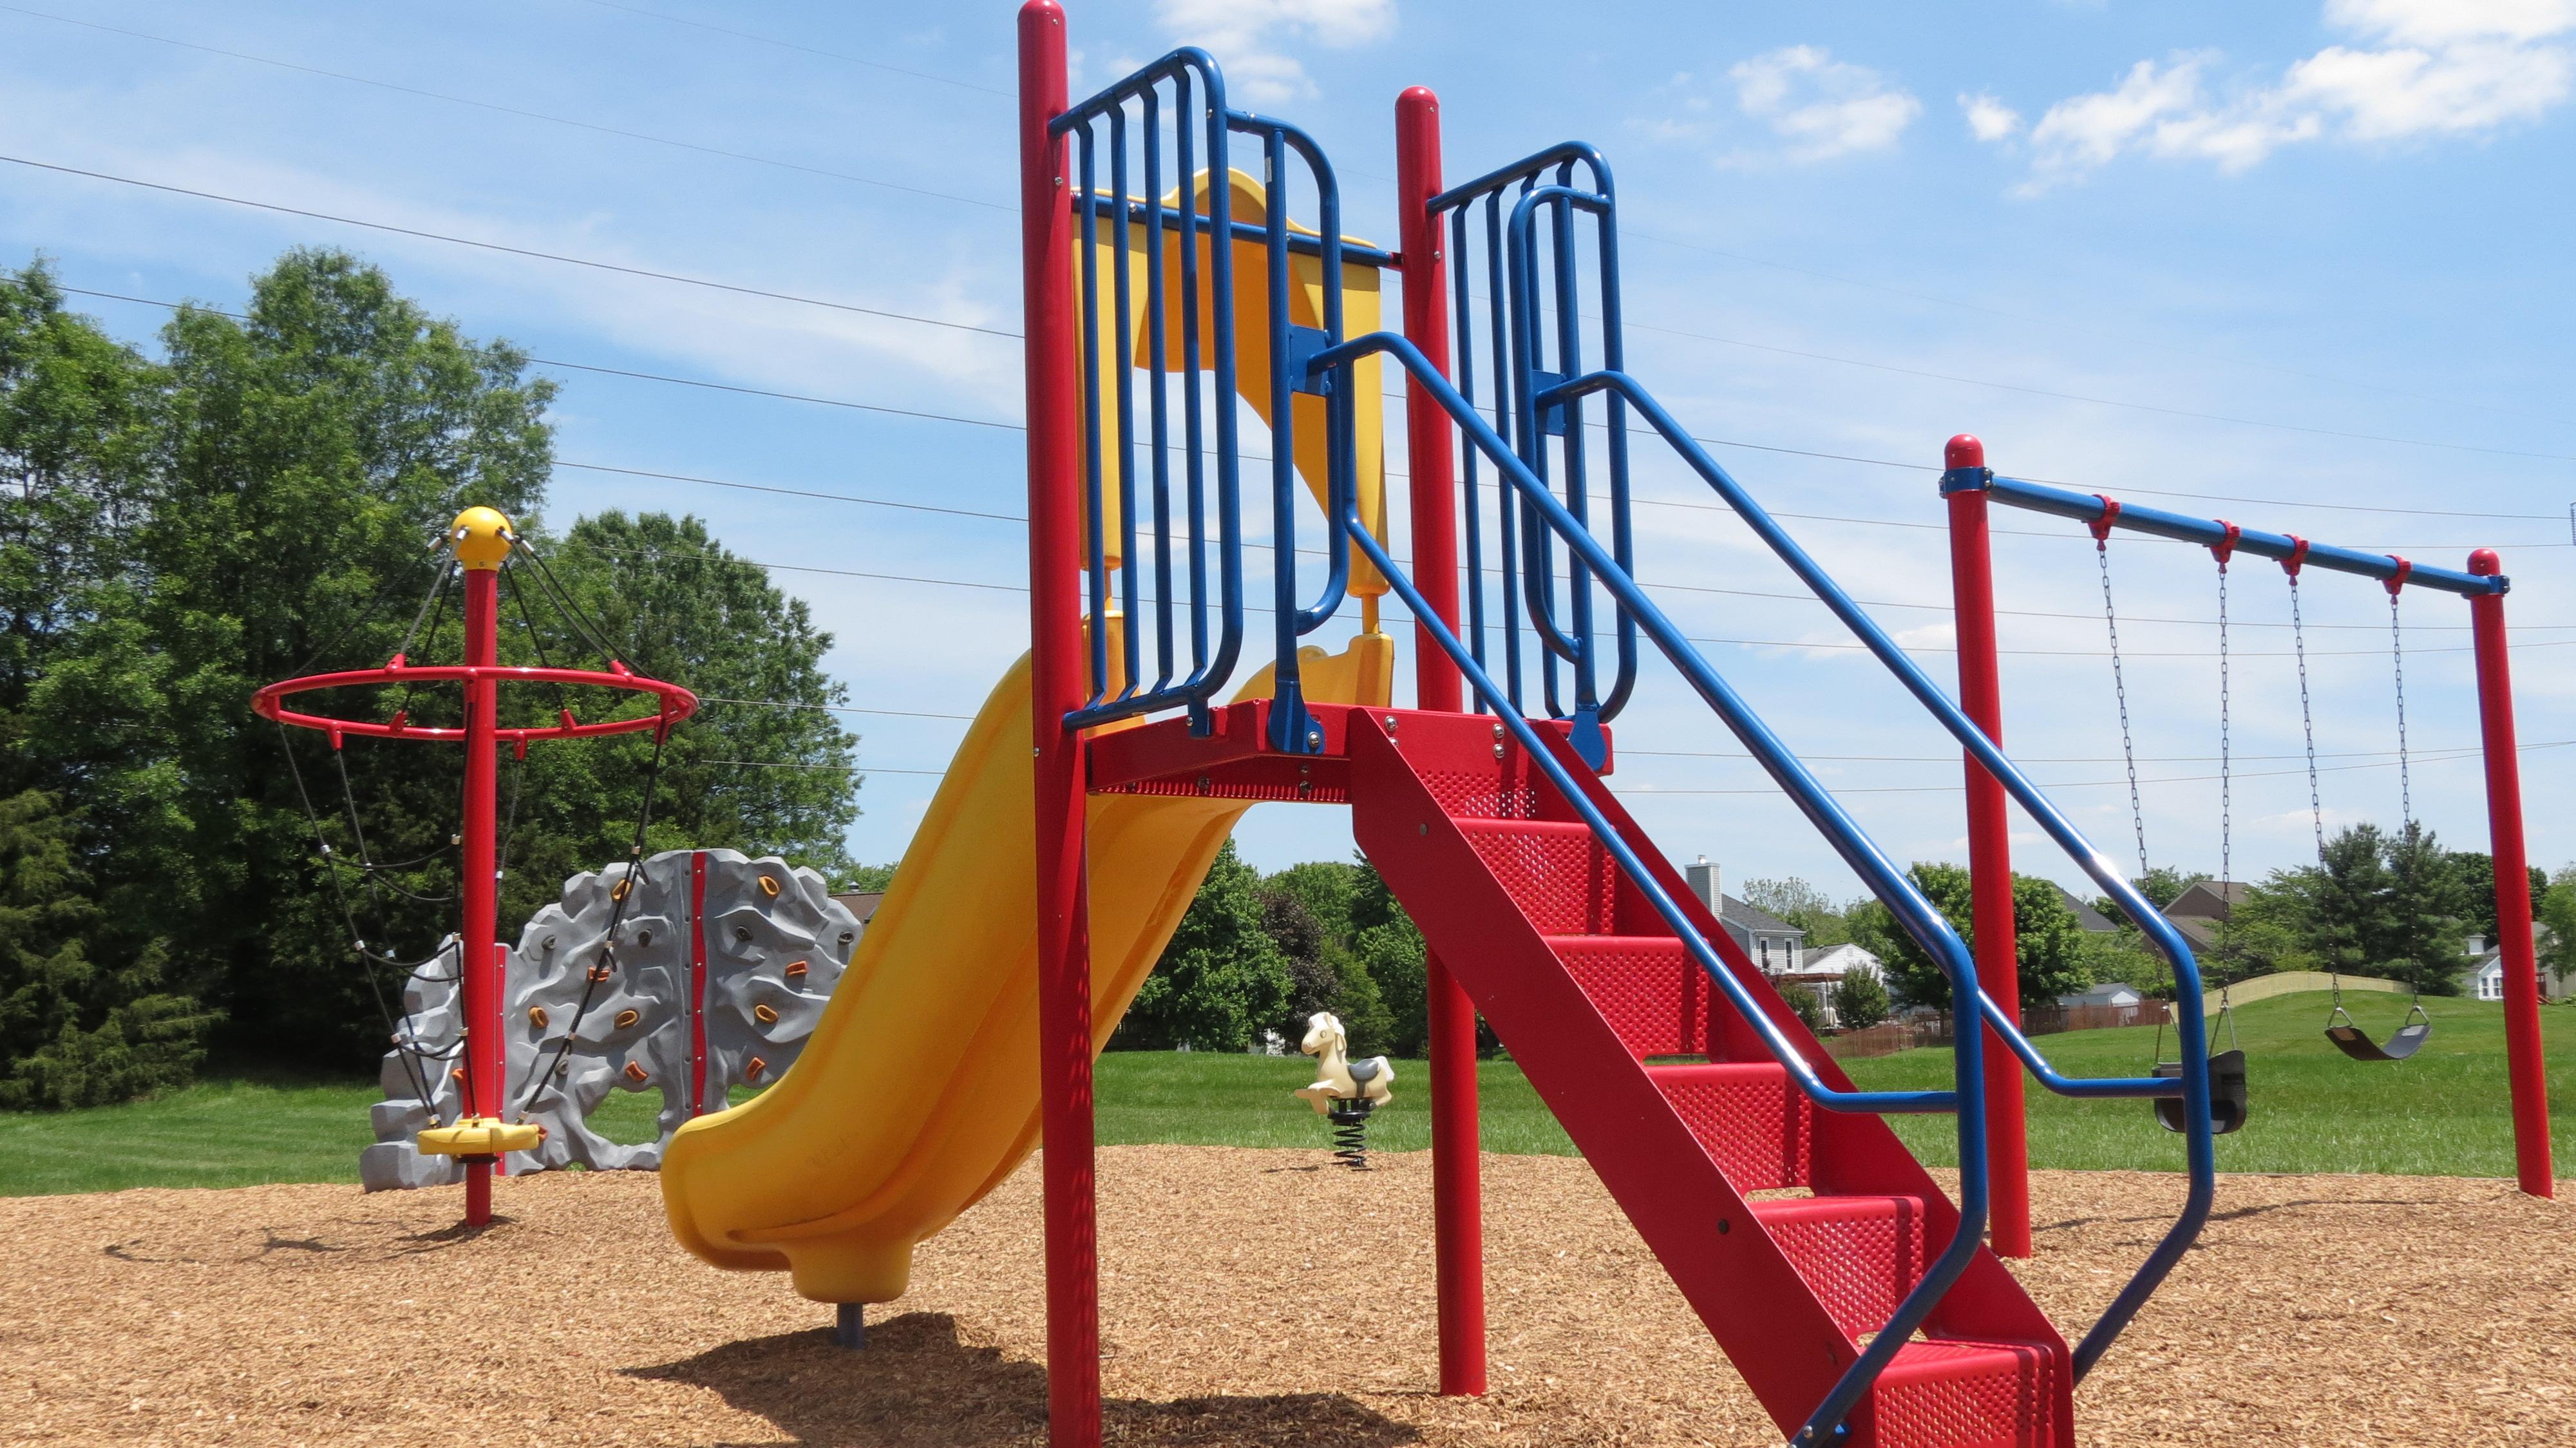 Spinami Playground